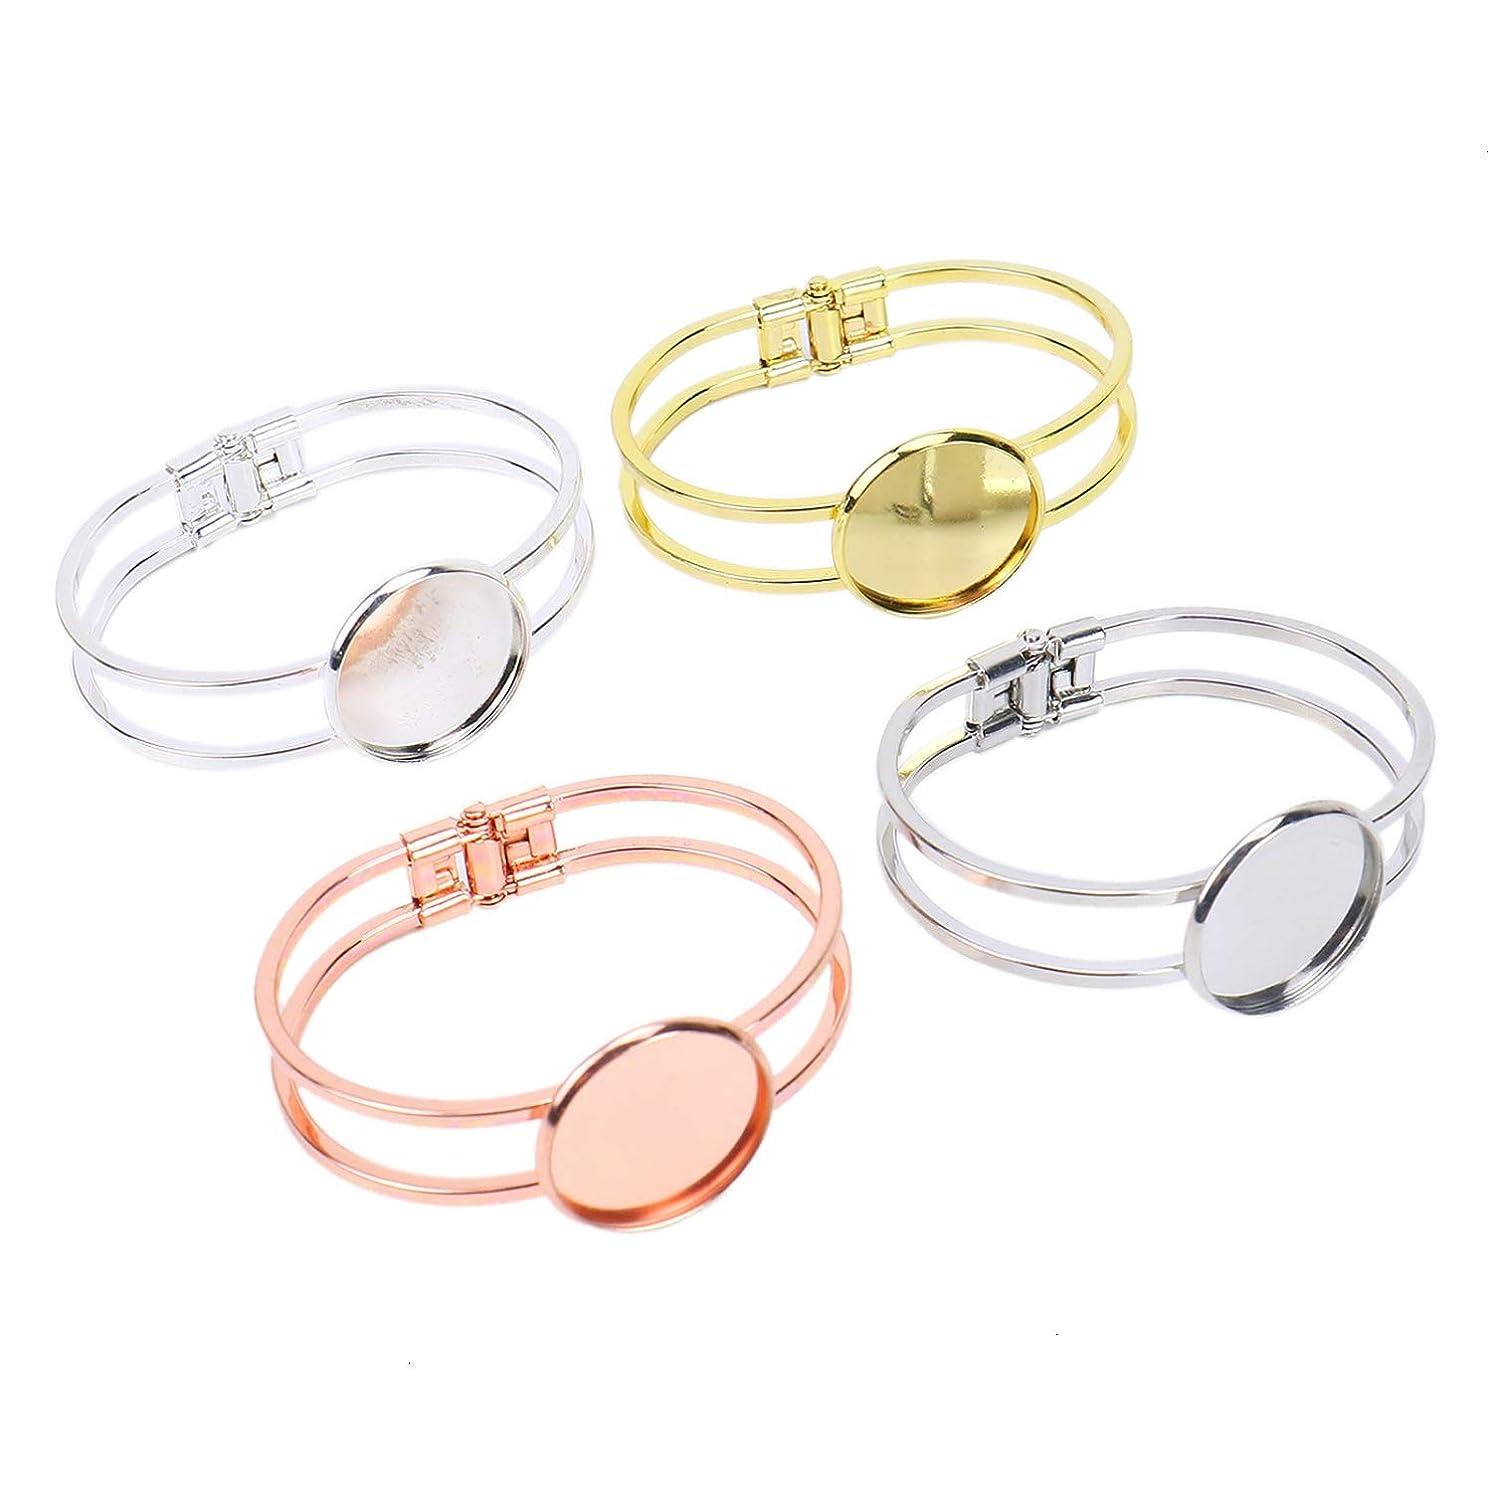 Monrocco 4 pcs Brass Cuff Bracelet Bangle Blanks Fit 25mm Cabochon Cameo Settings Bezel Tray Jewelry Making